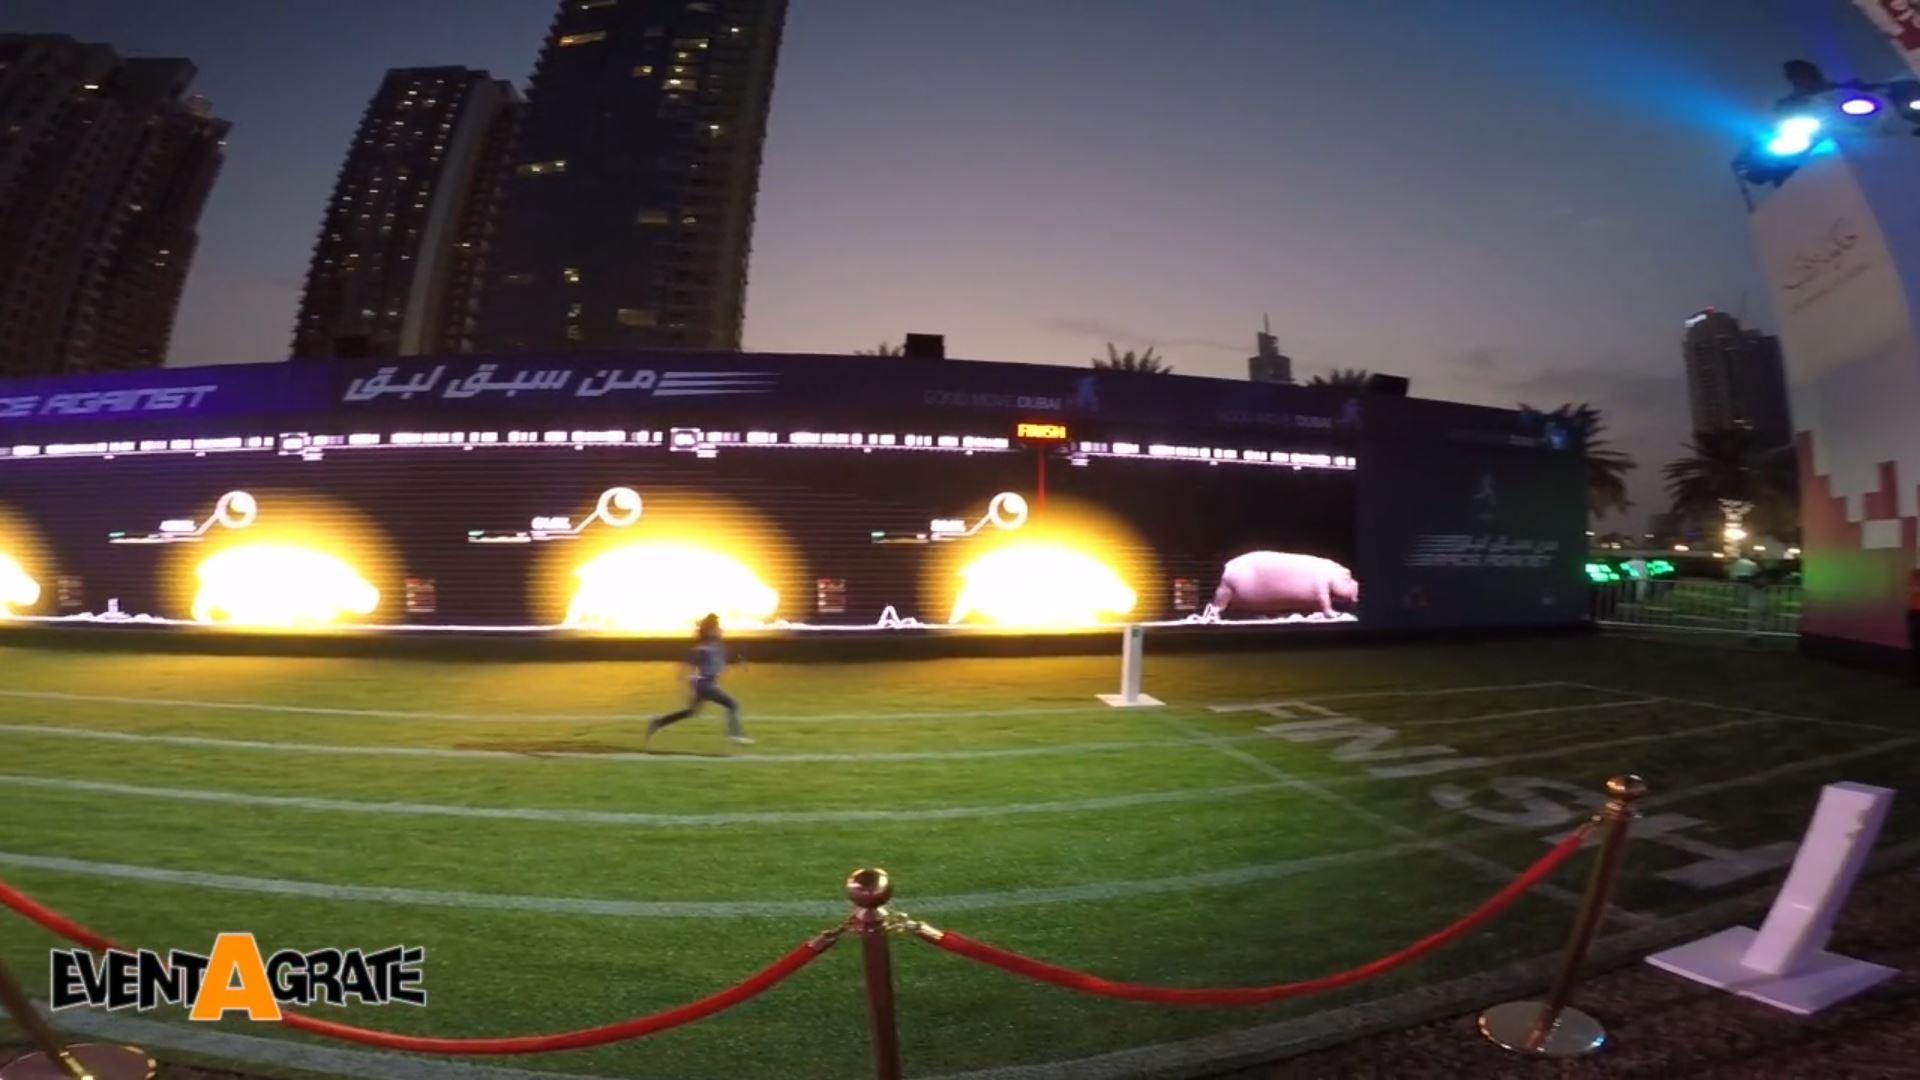 the run interactive running wall sesor technology high tech animation